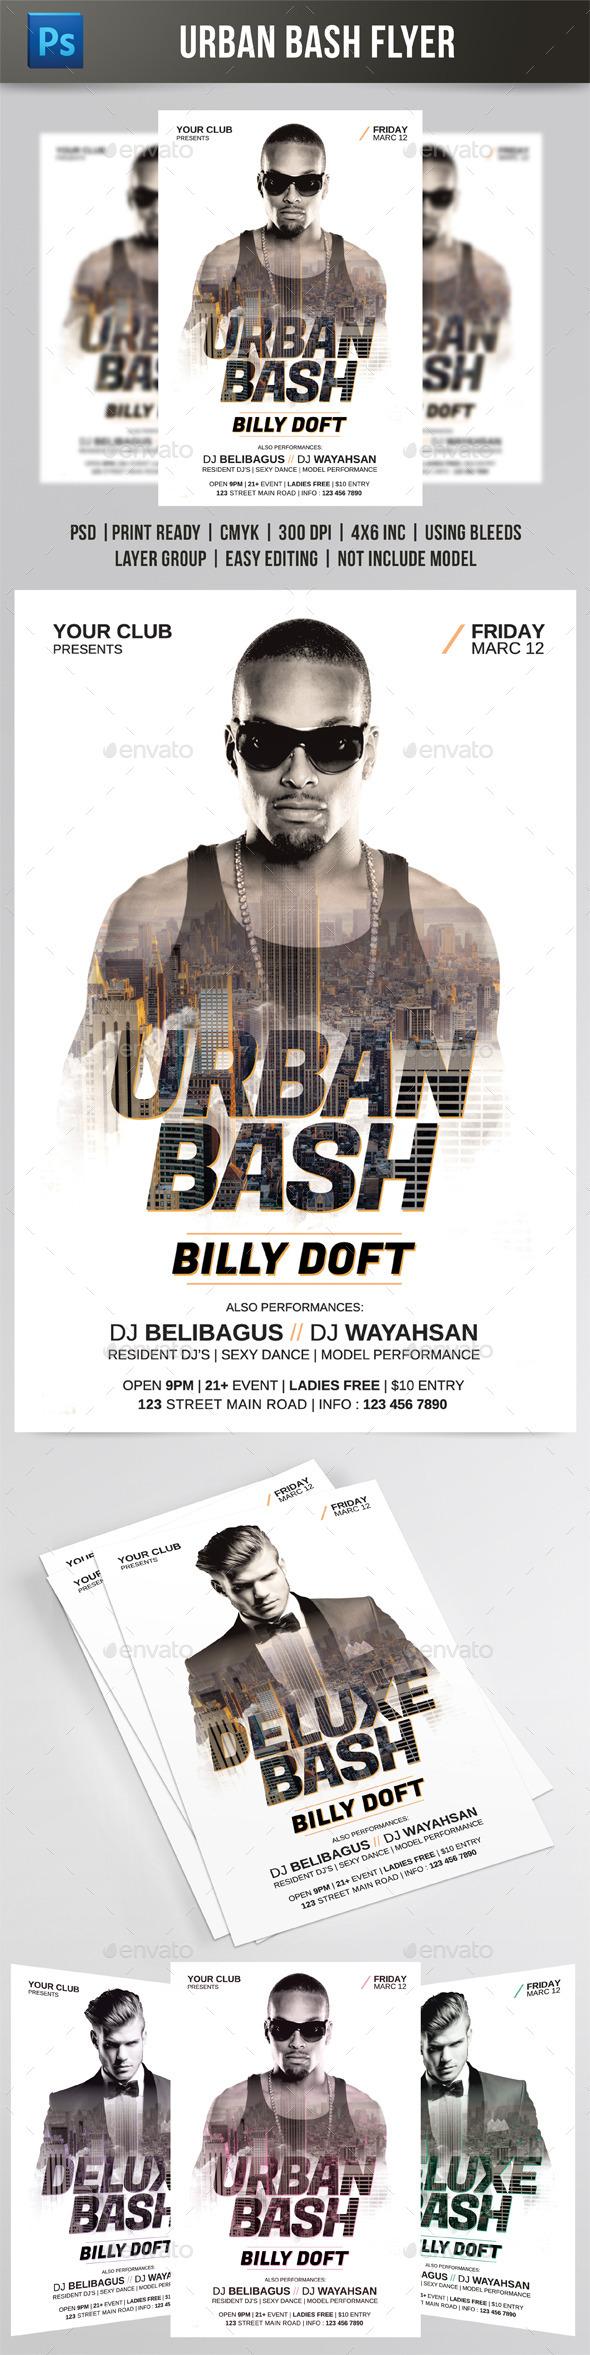 Urban Bash Flyer - Events Flyers